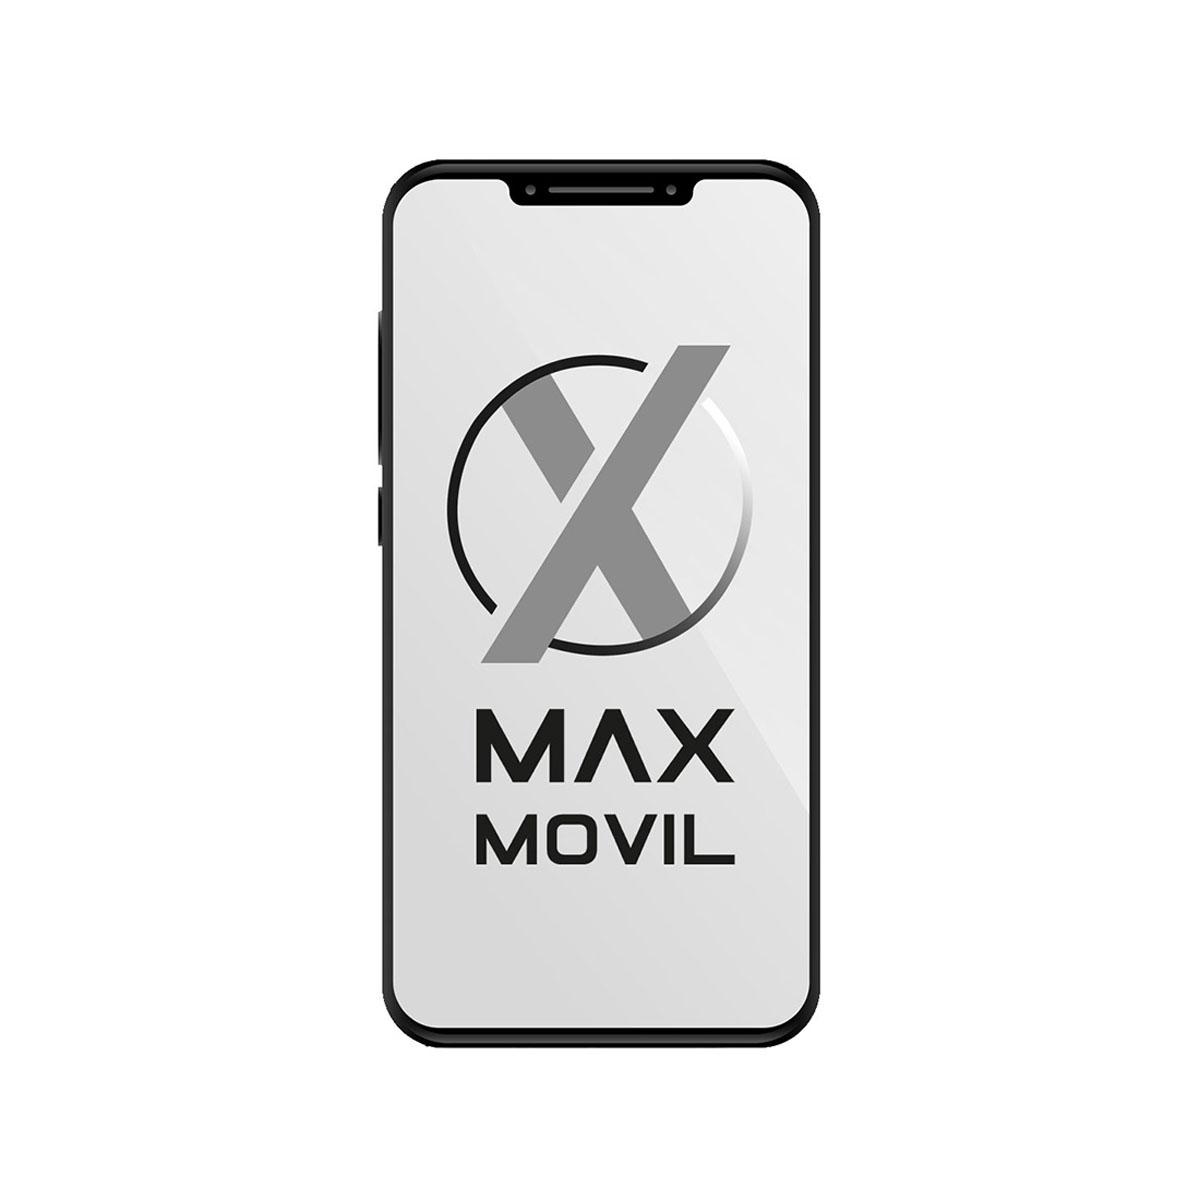 Huawei Mate 20 Pro 6GB/128GB Azul Dual SIM LYA-LX9